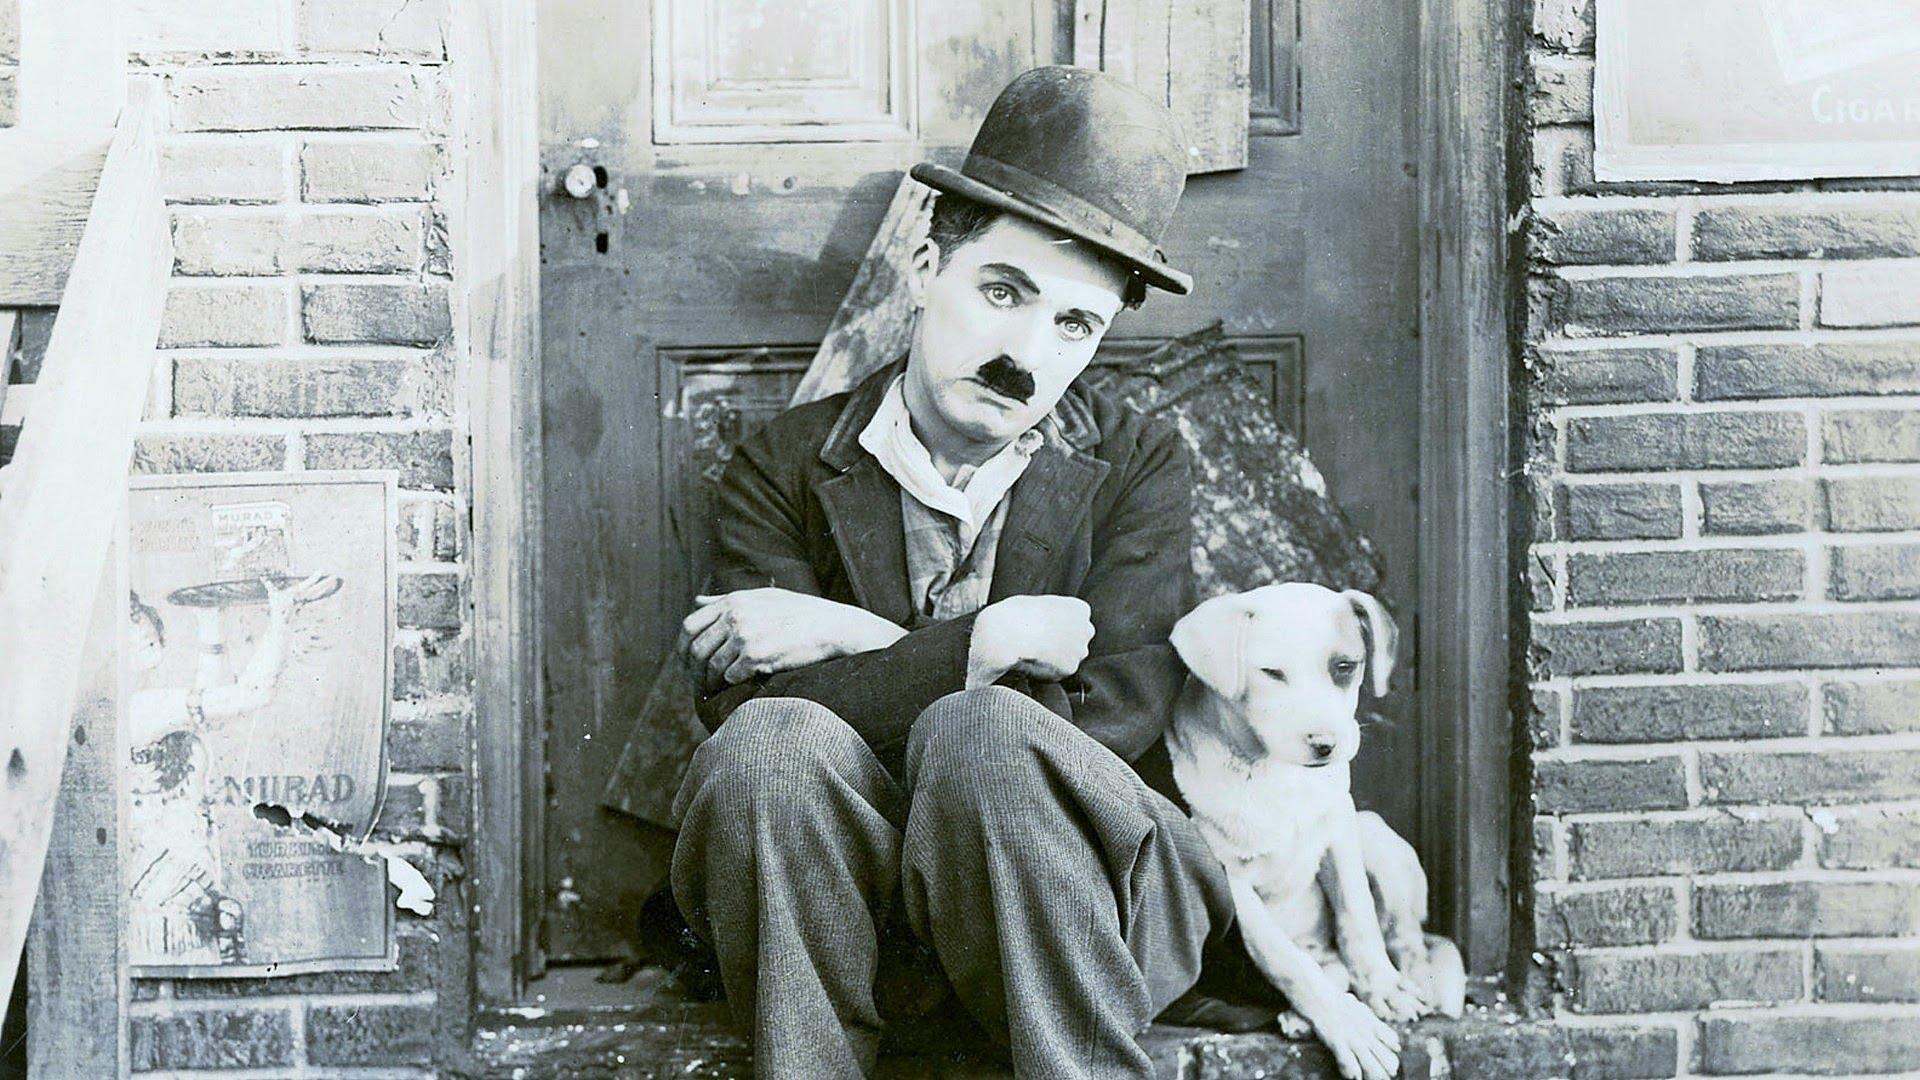 Charles-Chaplin-17